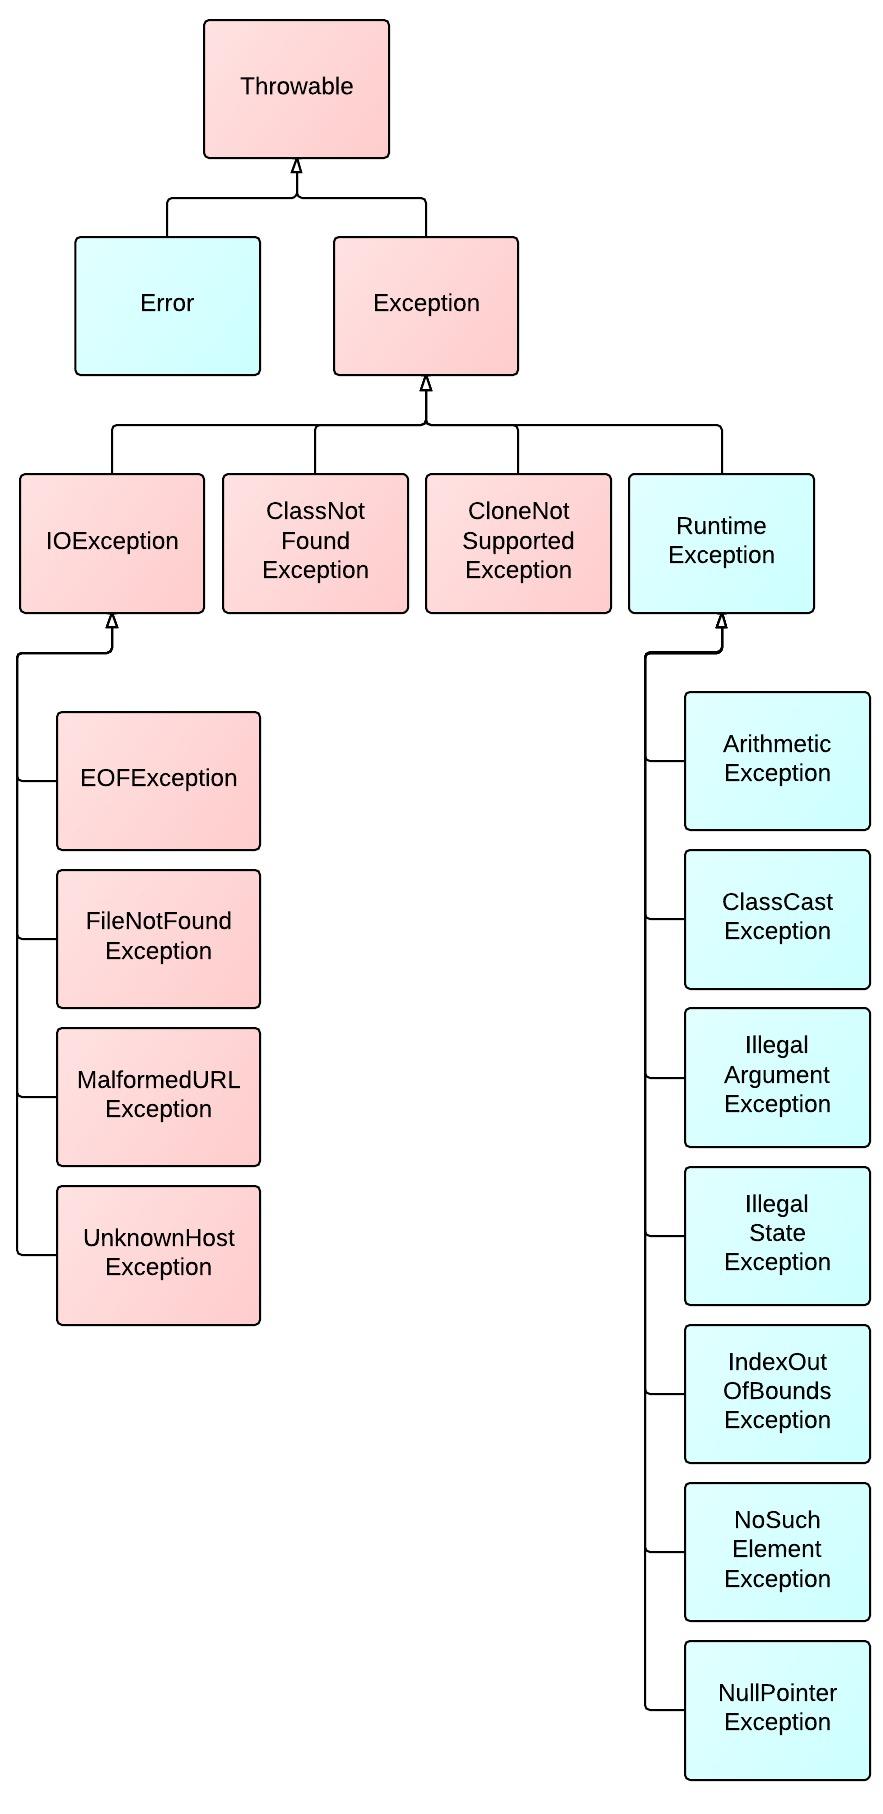 jvm architecture in java with diagram 2006 chevrolet silverado radio wiring top 8 diagrams for understanding